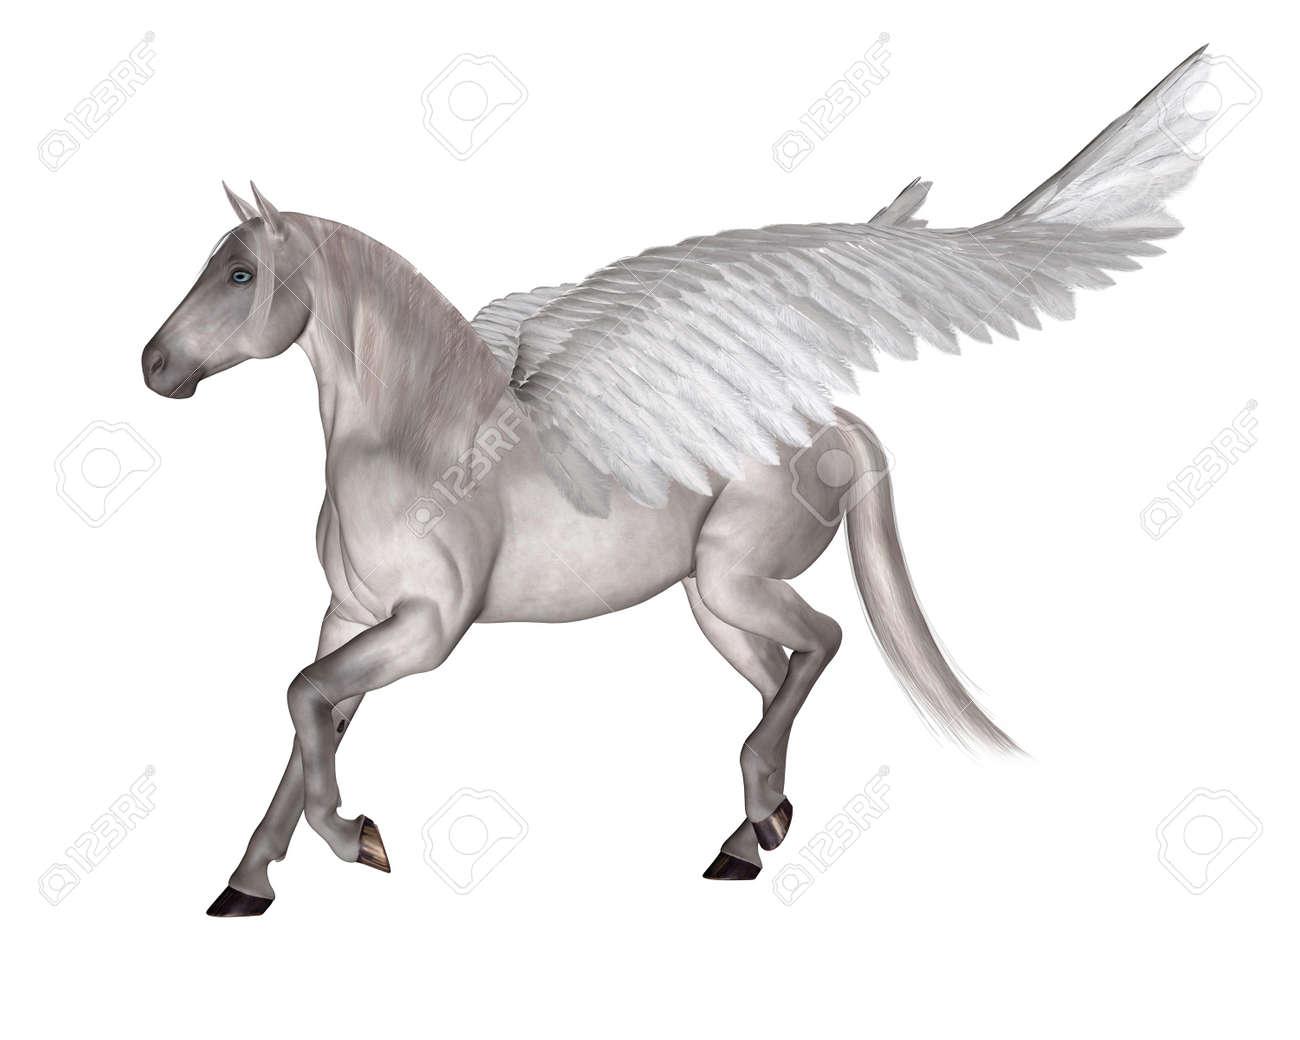 fantasy illustration of pegasus the flying horse of greek